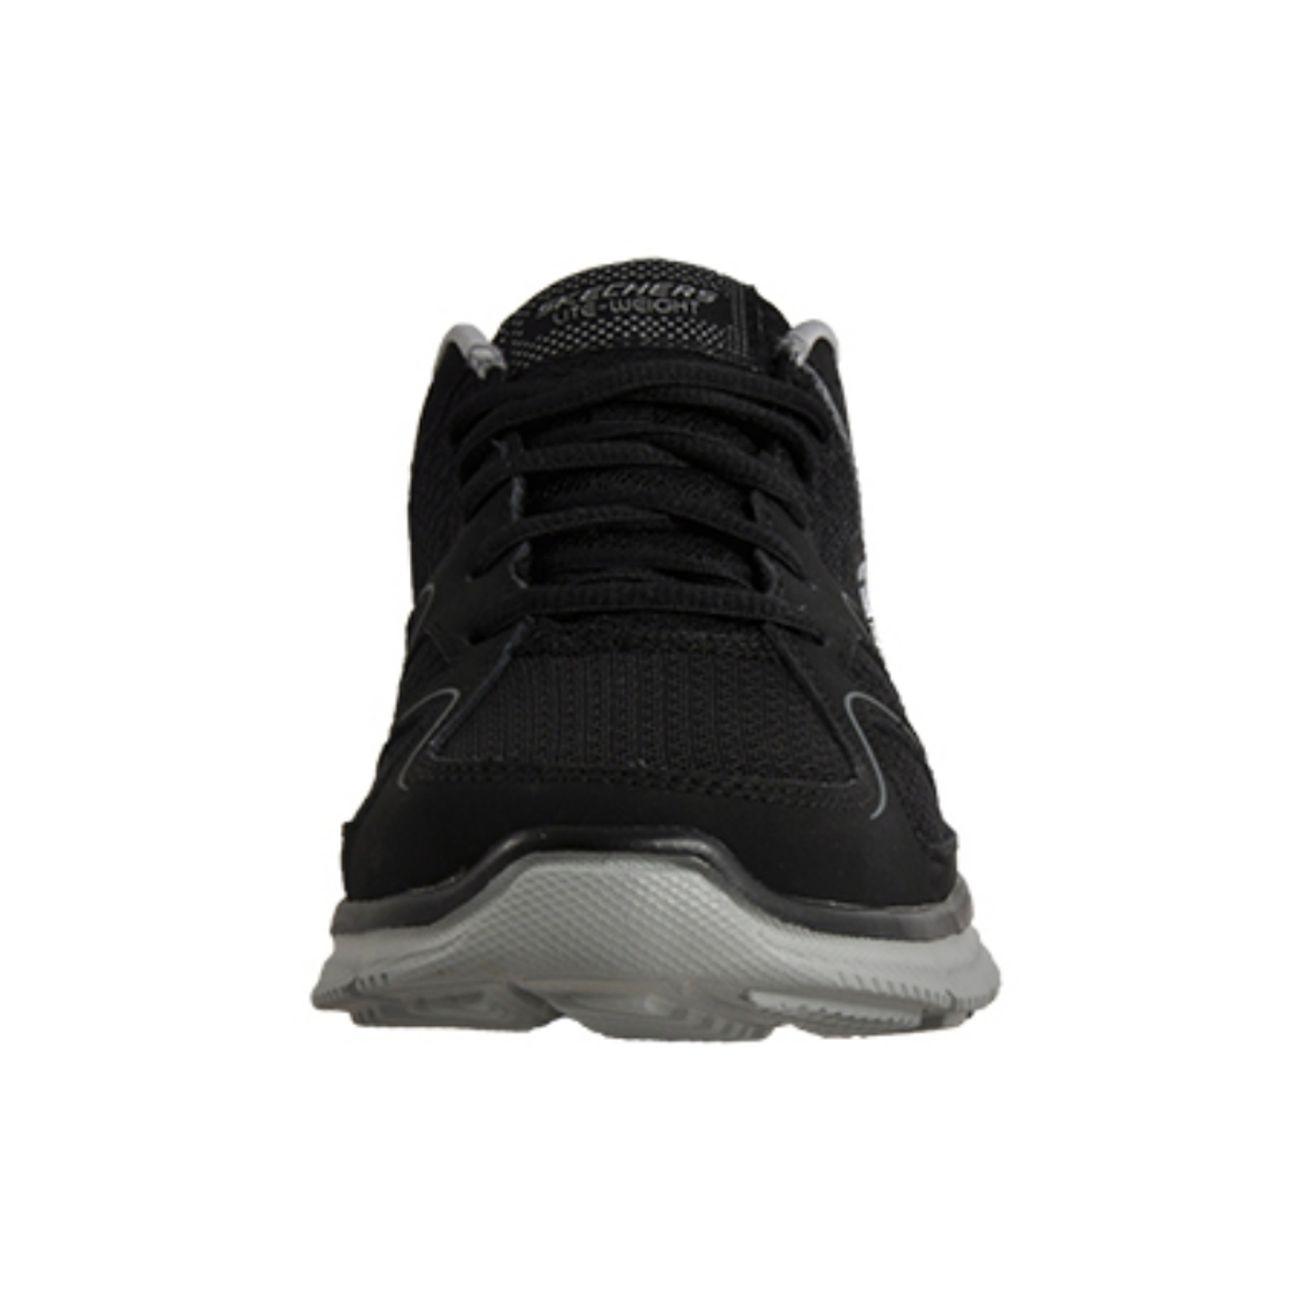 running homme SKECHERS Skechers Flash Point Memory Foam Hommes Chaussures De Running Baskets Sportives